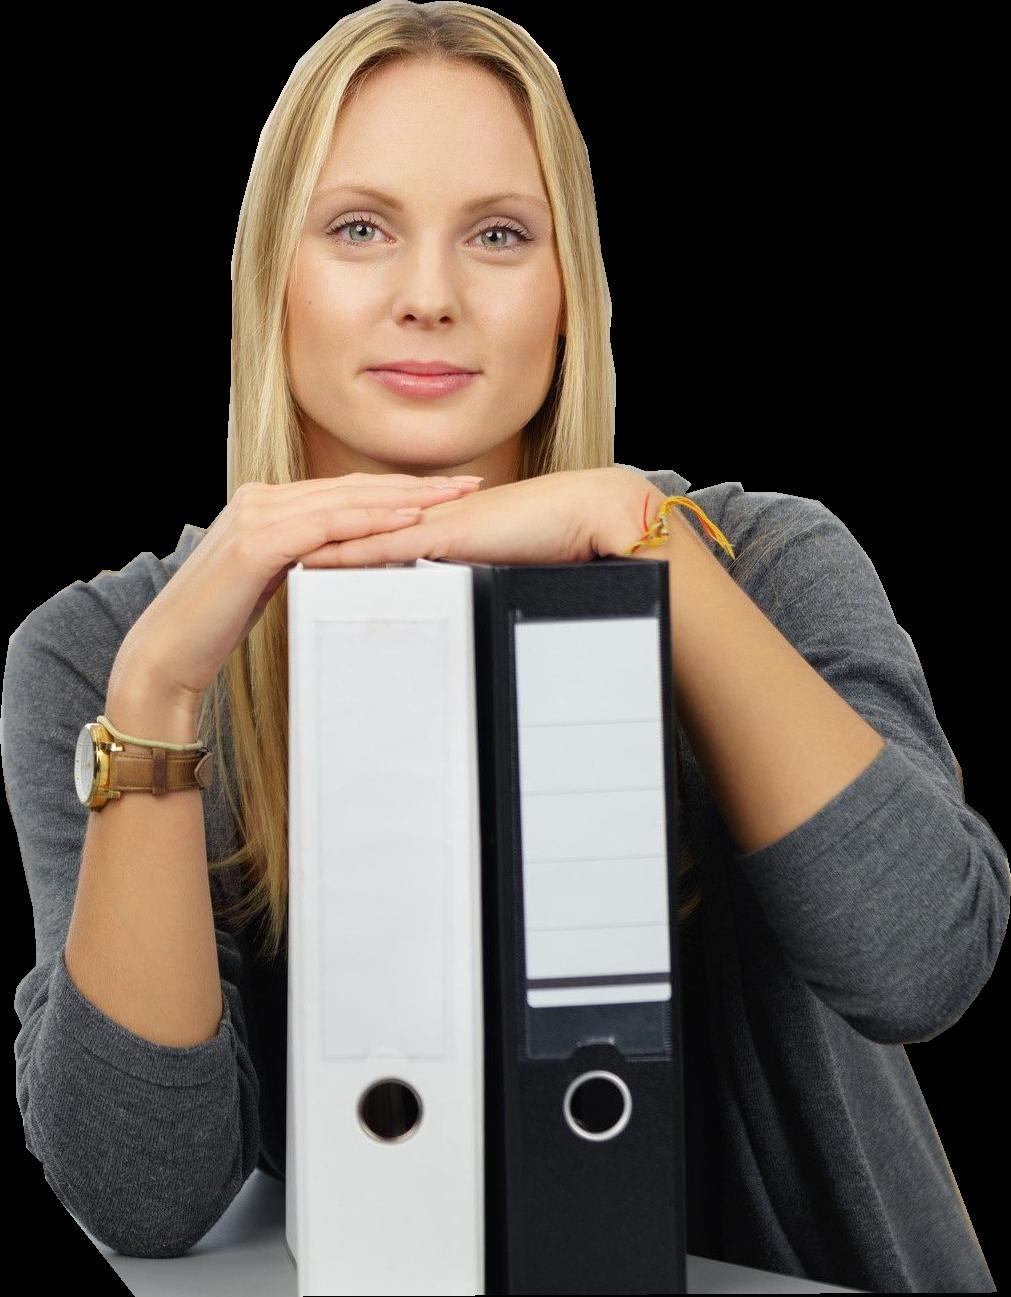 Datenschutz Frau